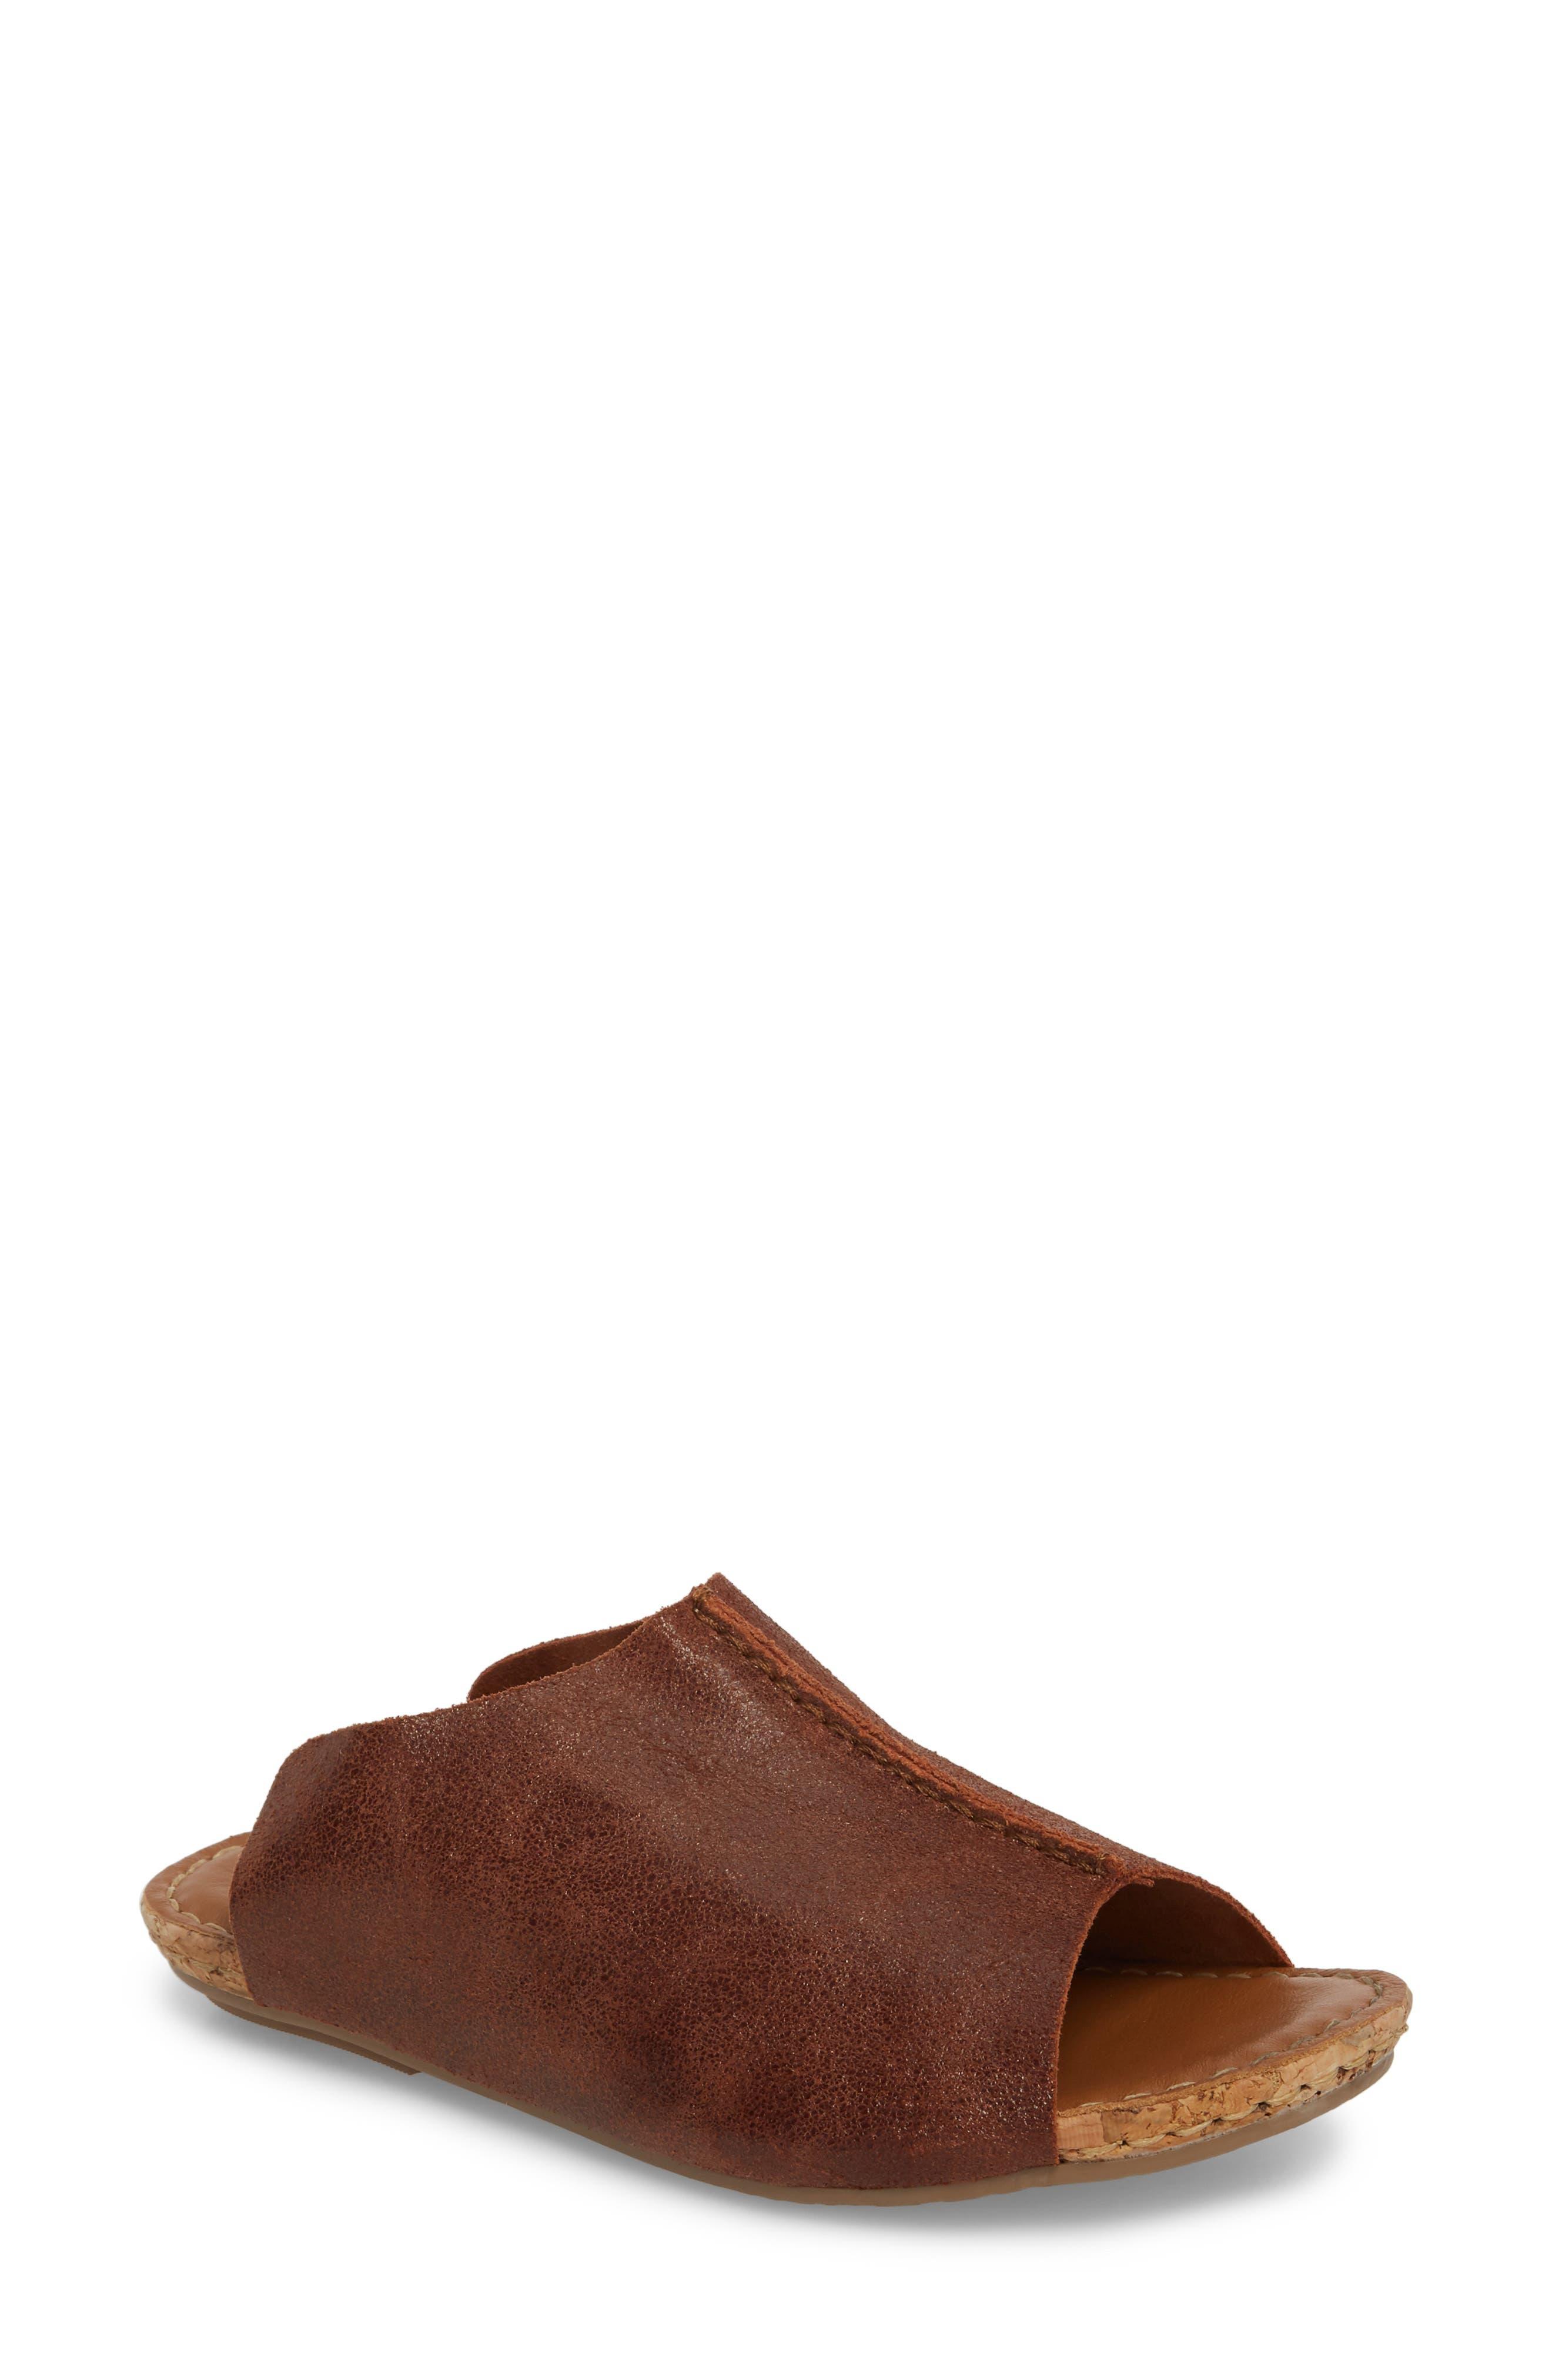 Gracey Slide Sandal,                         Main,                         color, Rum Leather